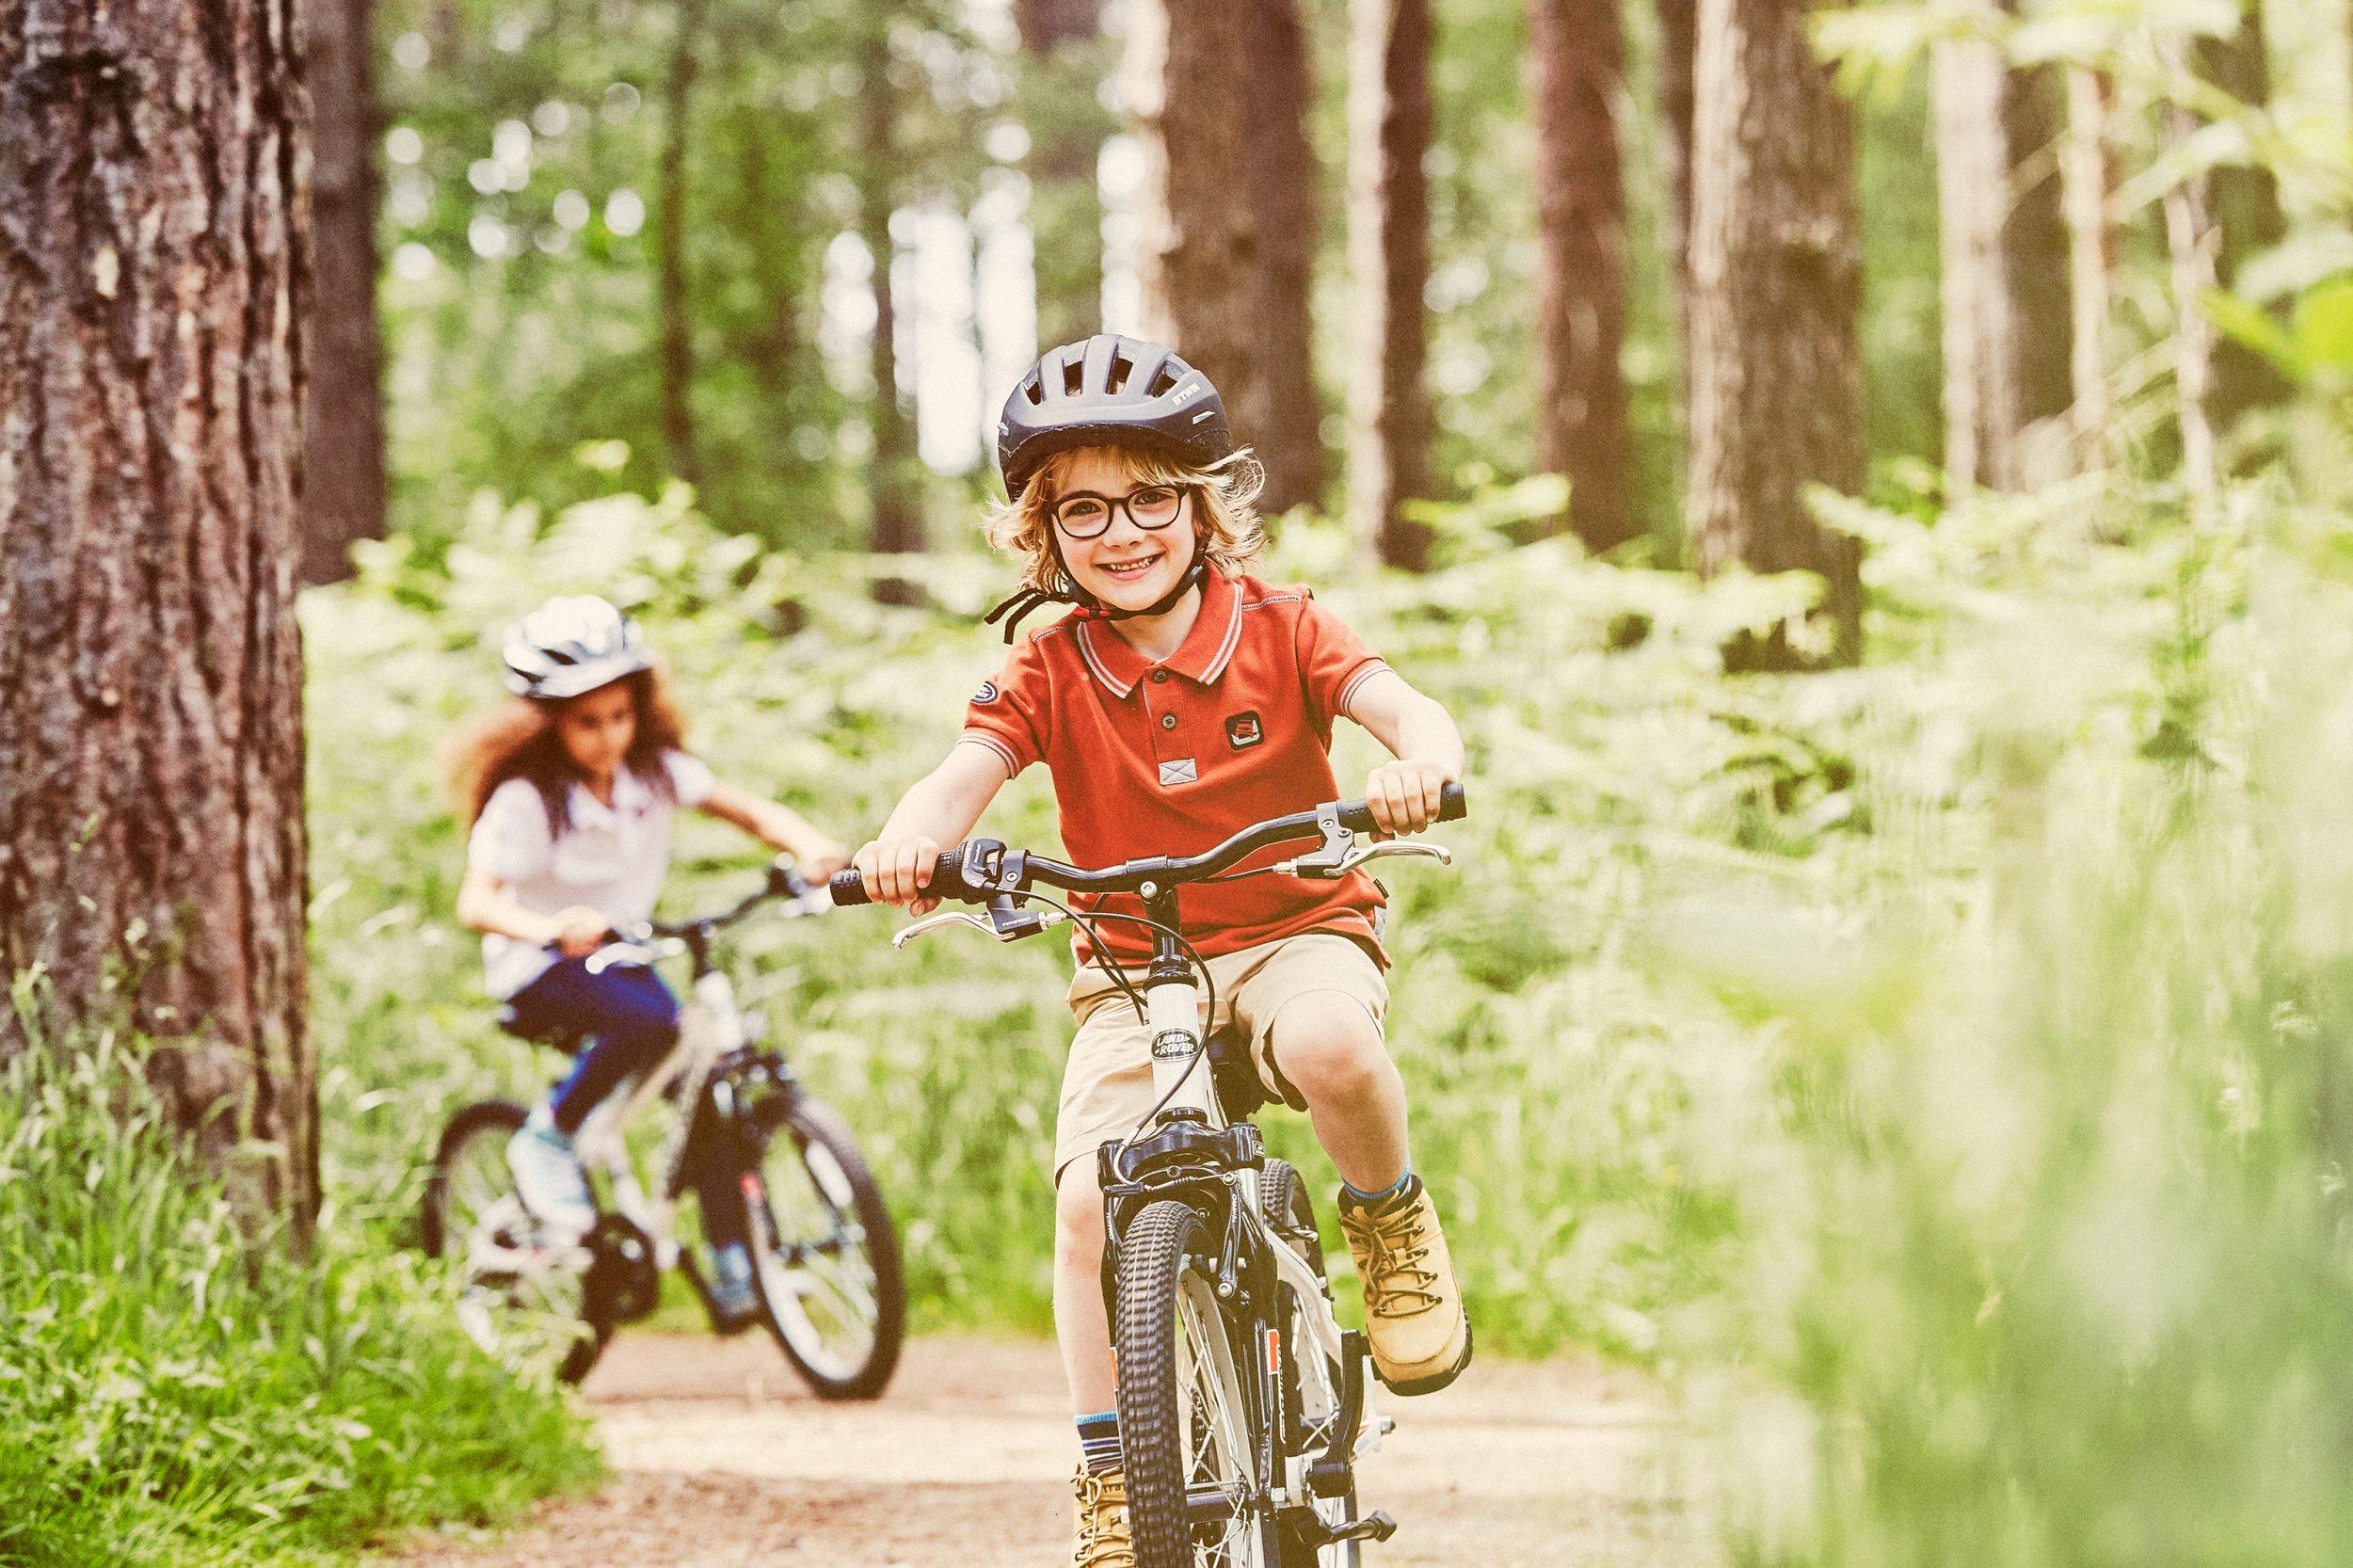 Landrover Kids Lifestyle